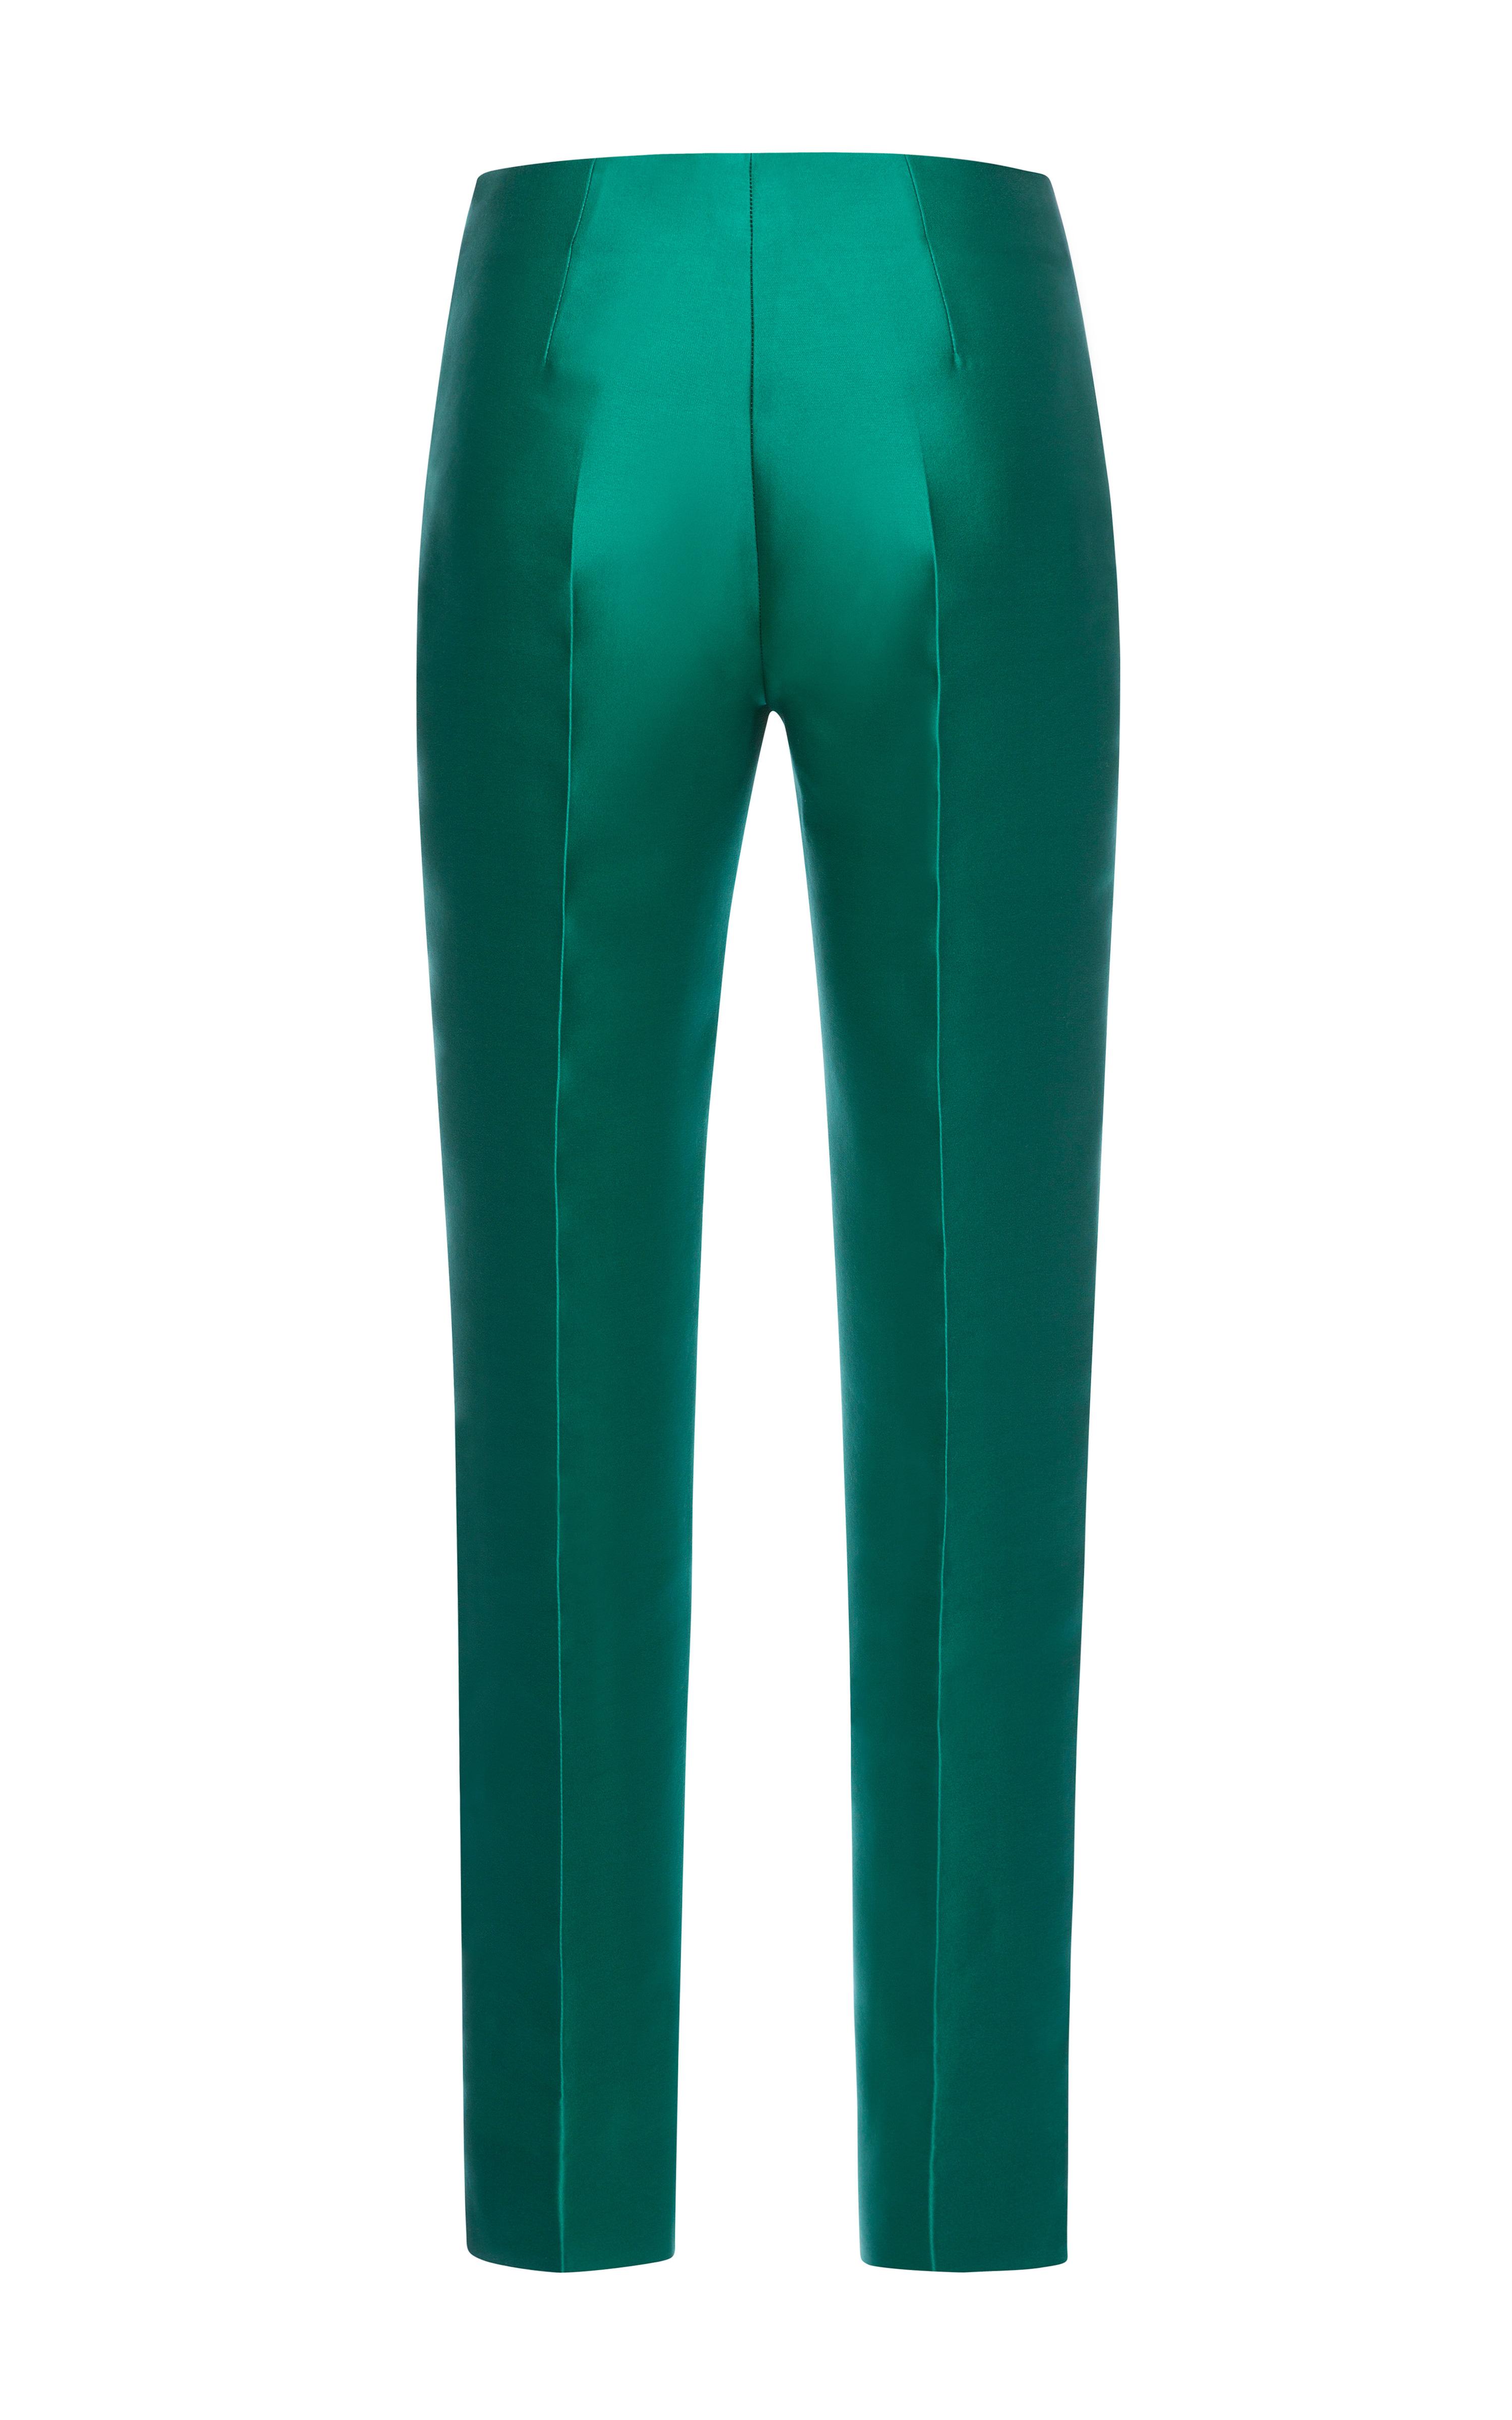 Emerald silk scuba trousers by antonio berardi